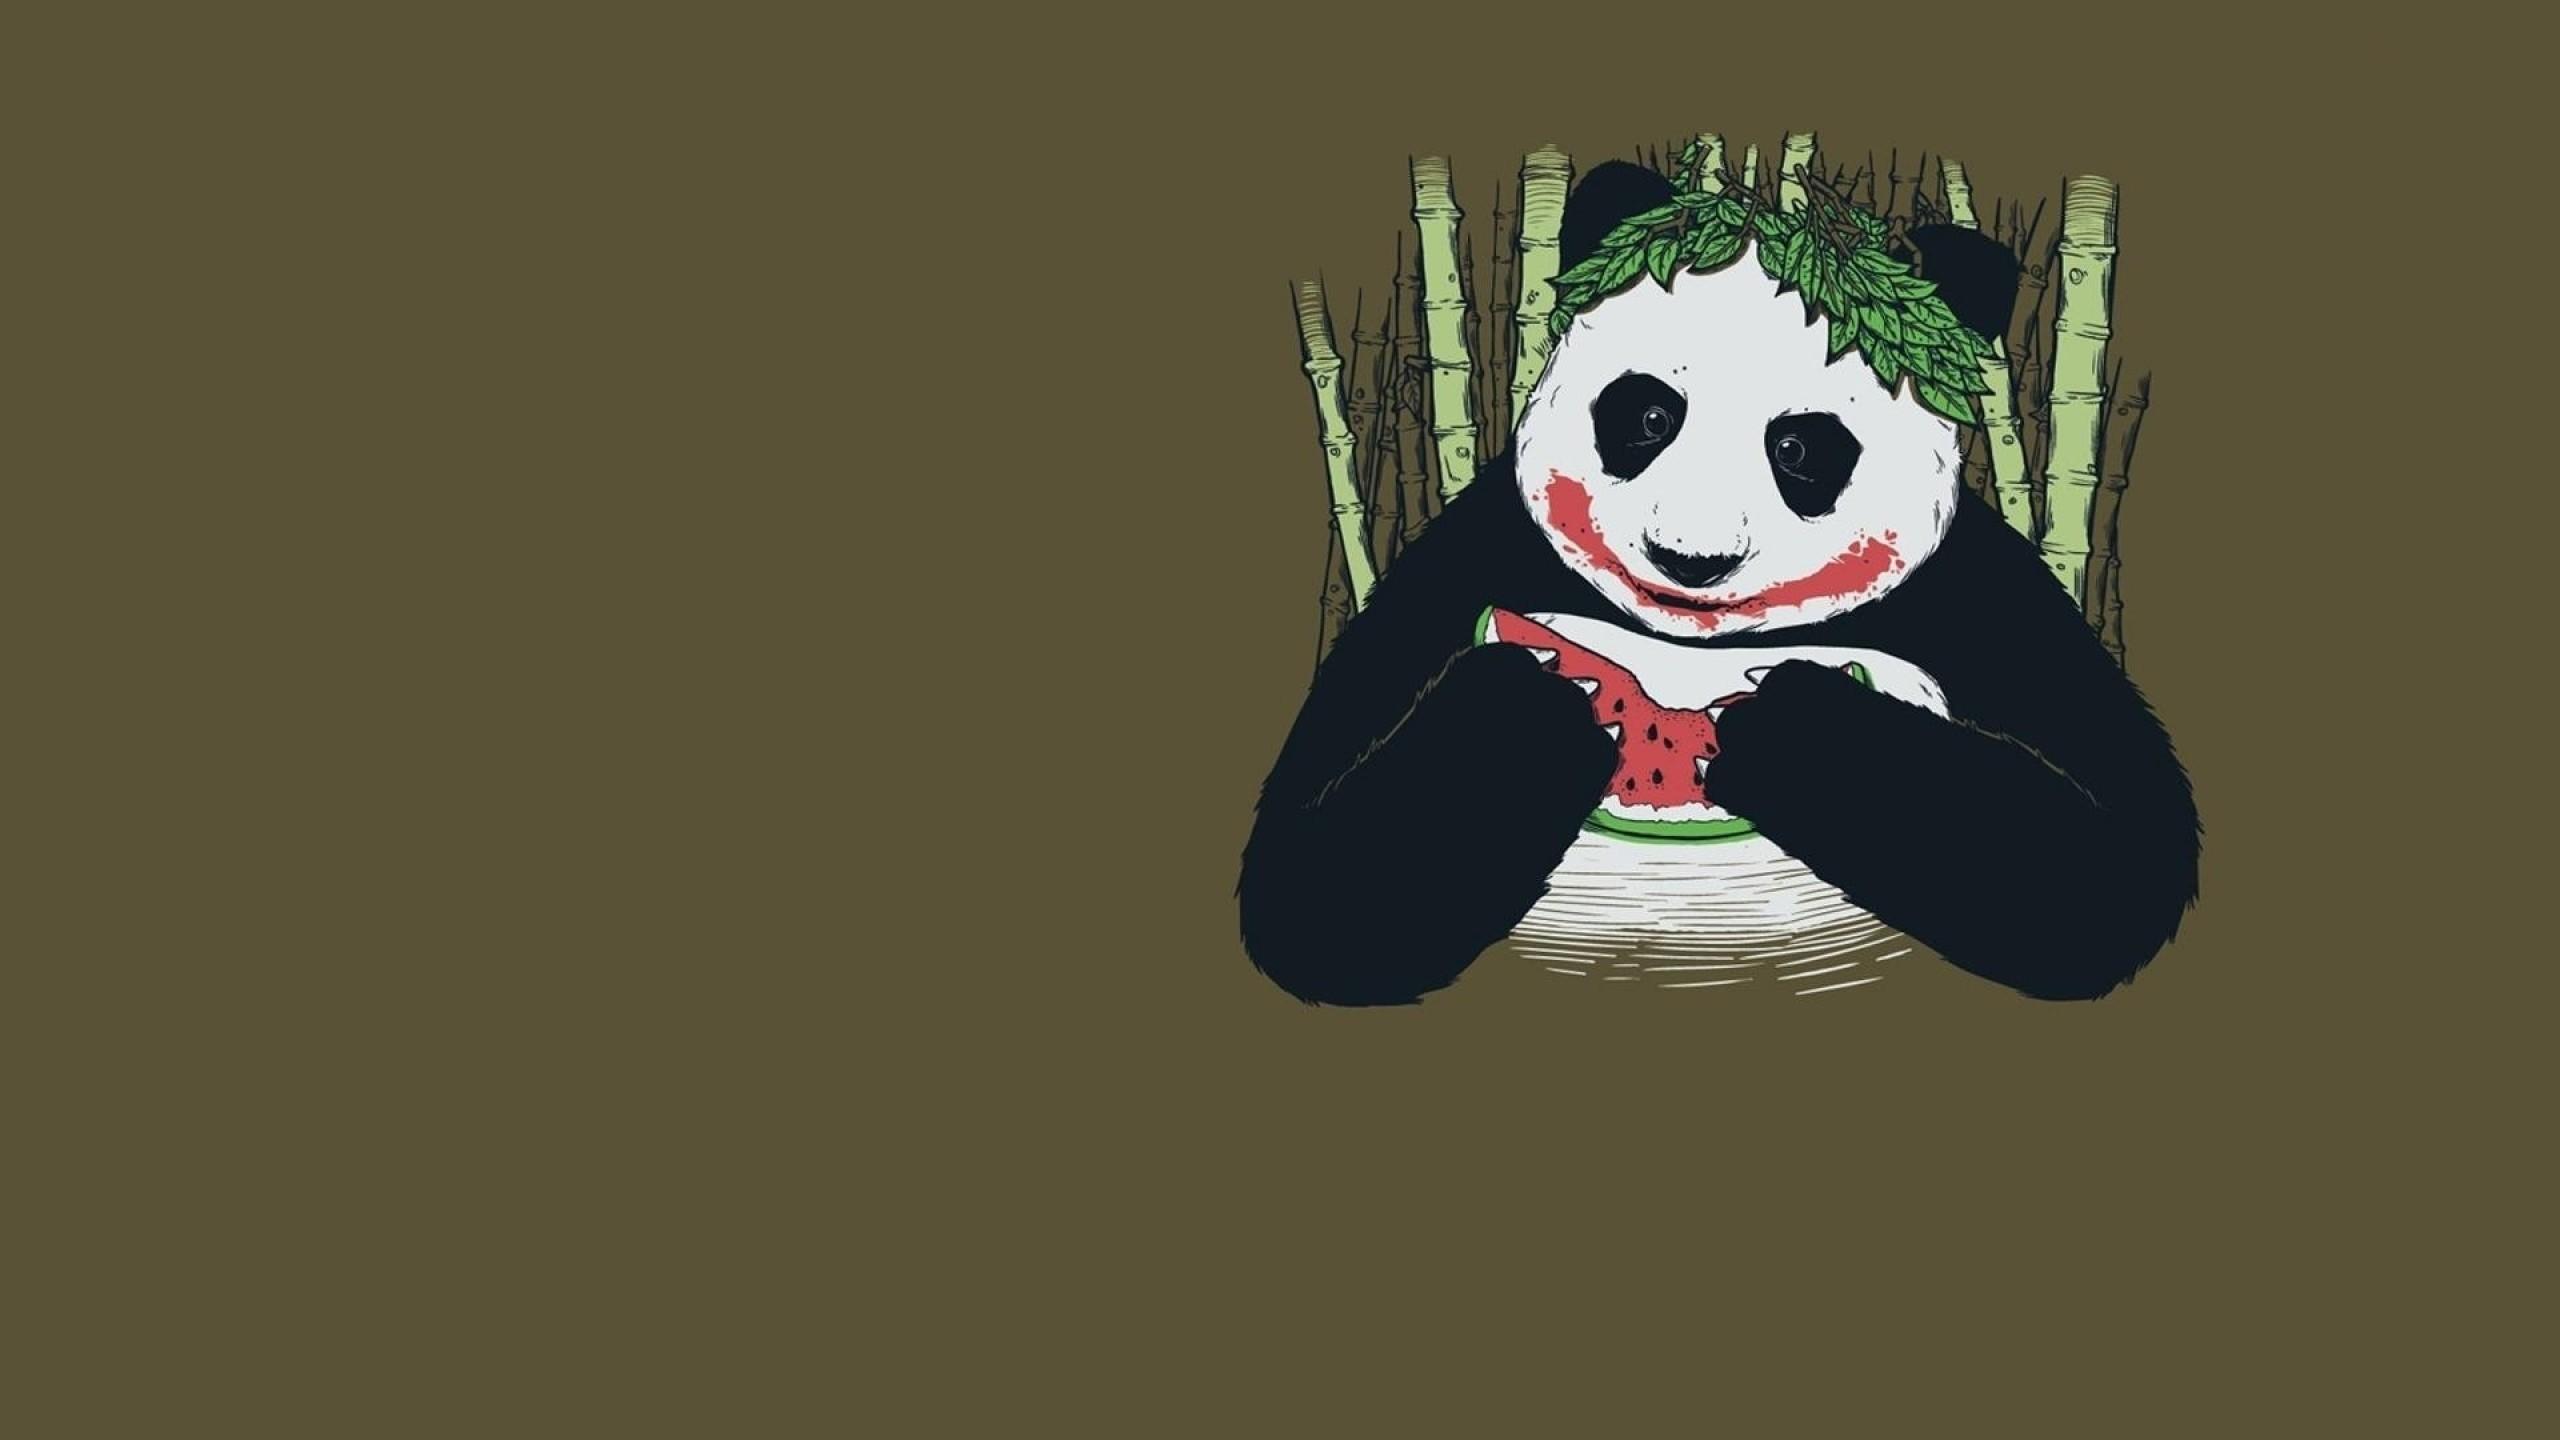 Wallpaper panda, joker, disguise